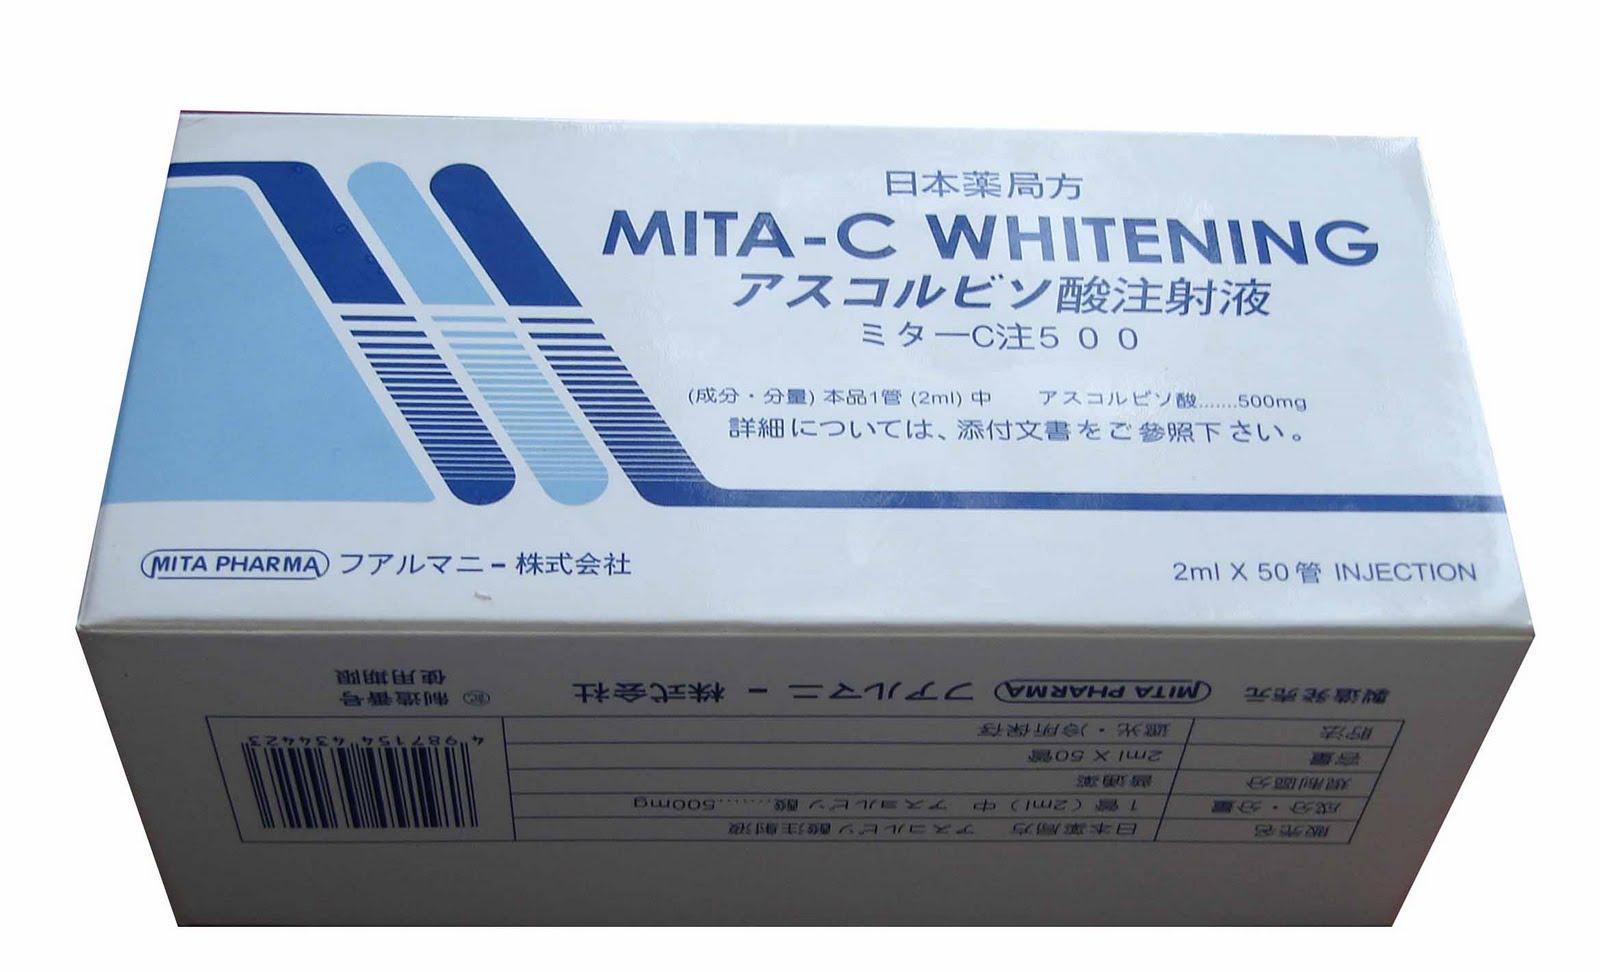 MITA-C WHITENING INJECTION, CINDERELLA SKIN WHITENING INJECTION,VITACICOL FORTE P3000